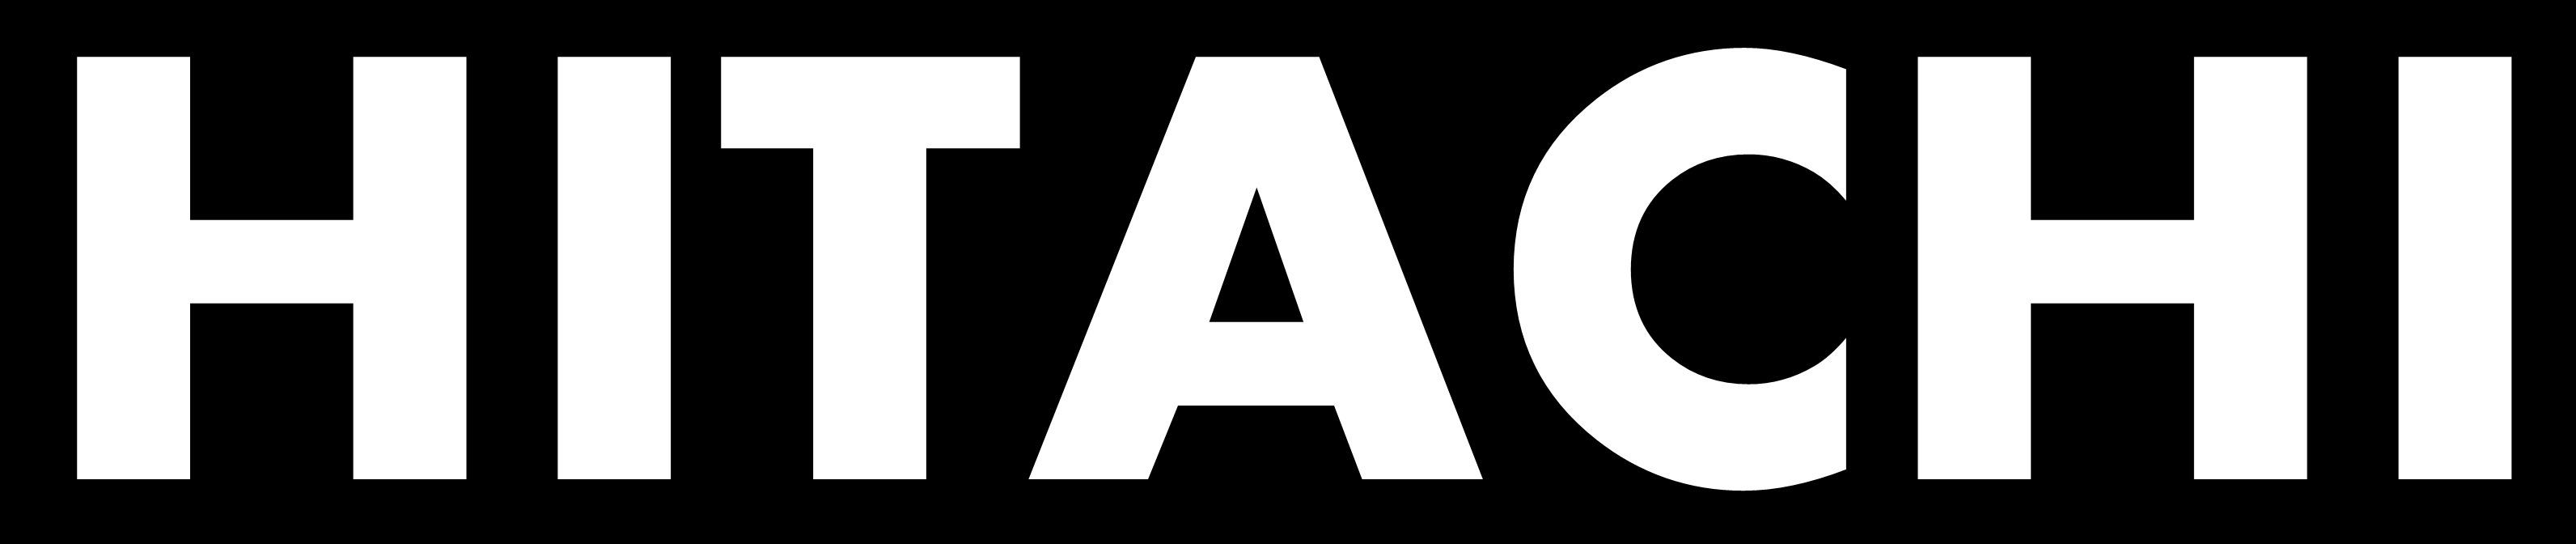 Hitachi Logo - Hitachi PNG